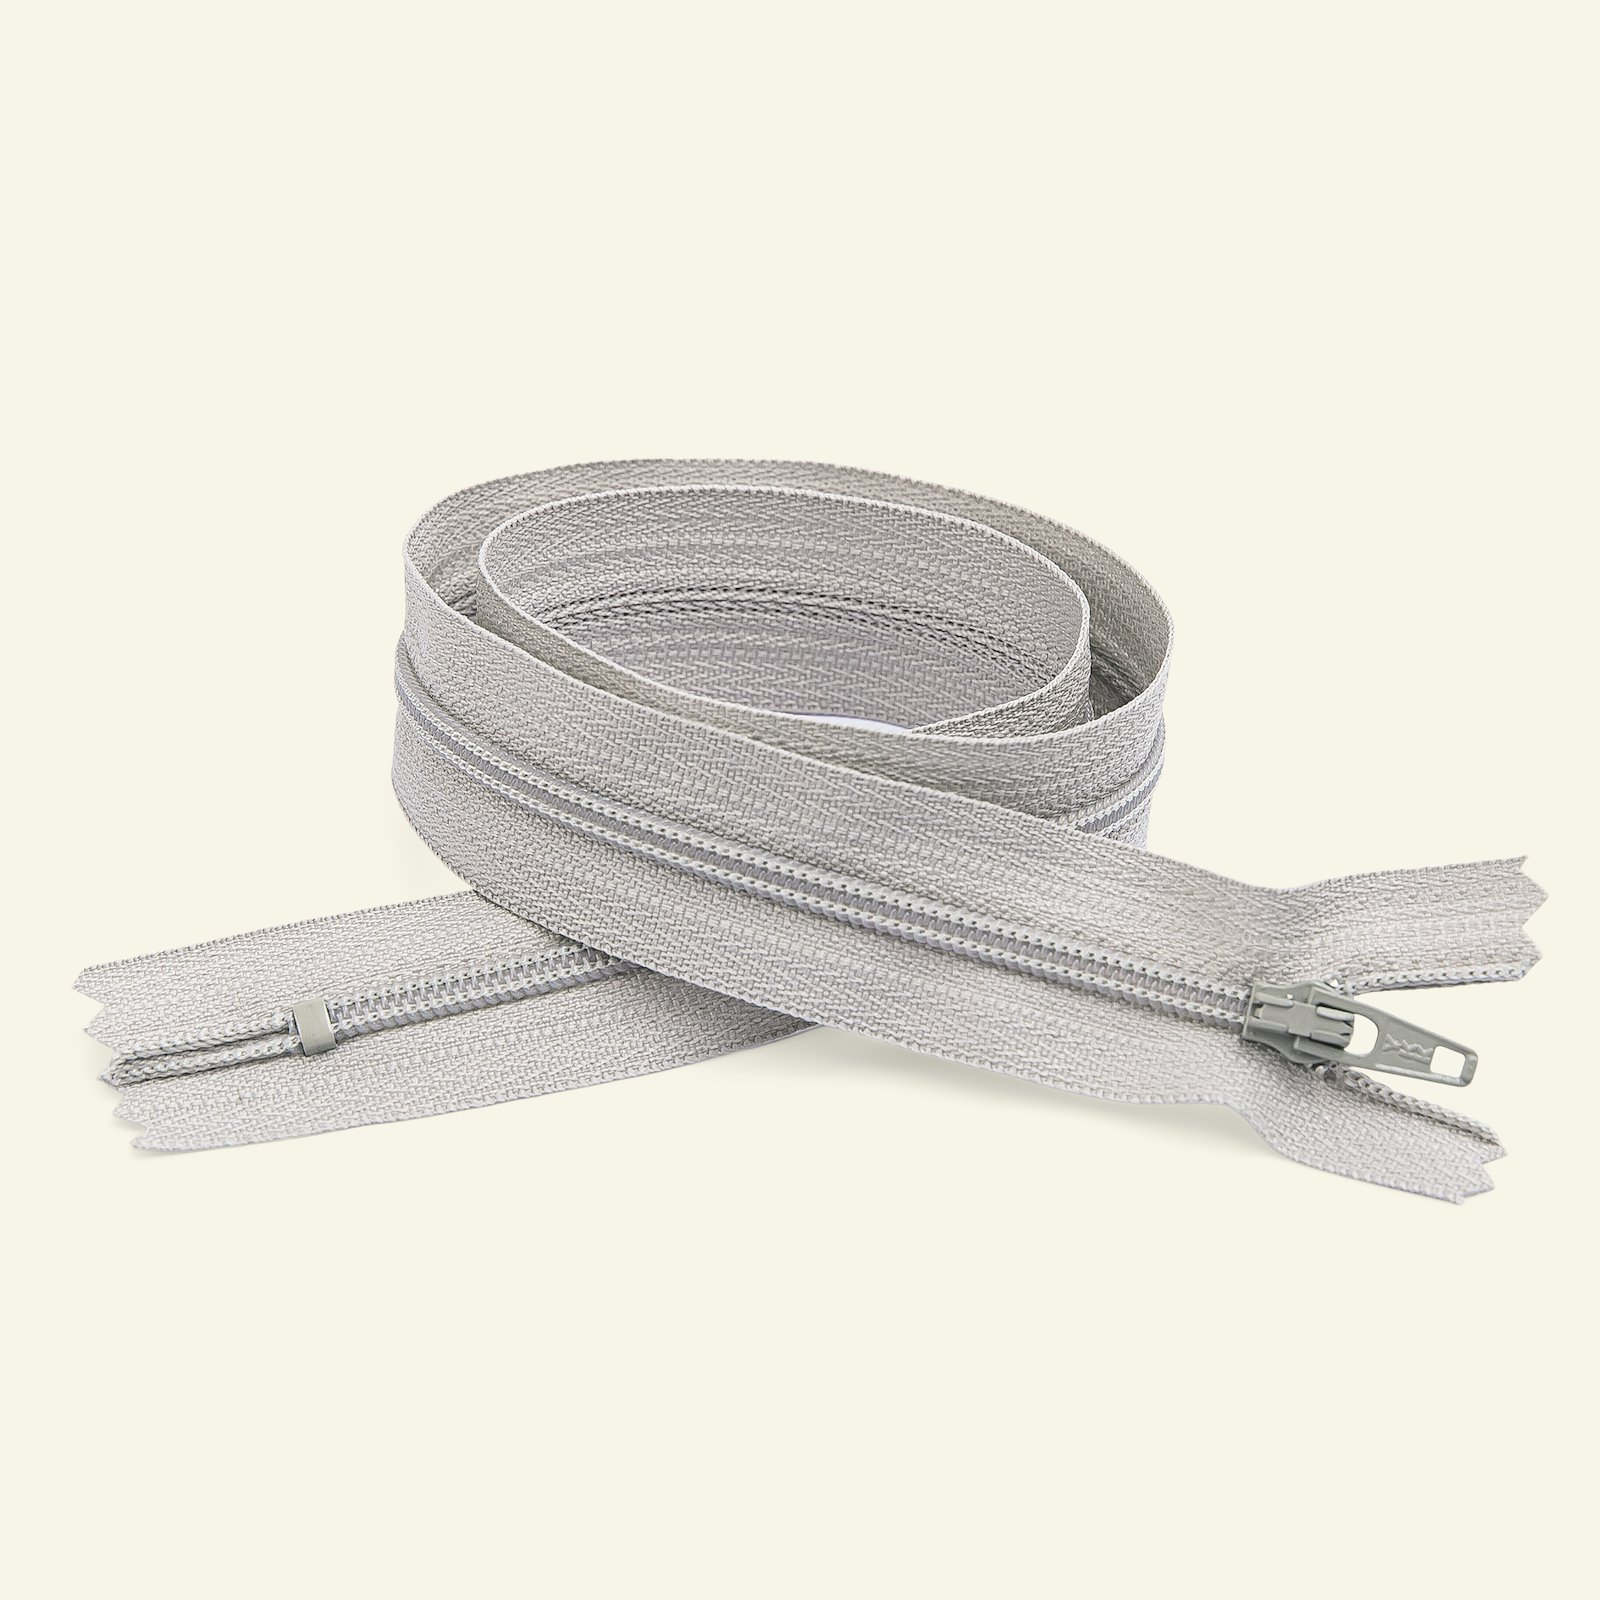 YKK zip 4mm closed end 55cm lt grey x40540_pack